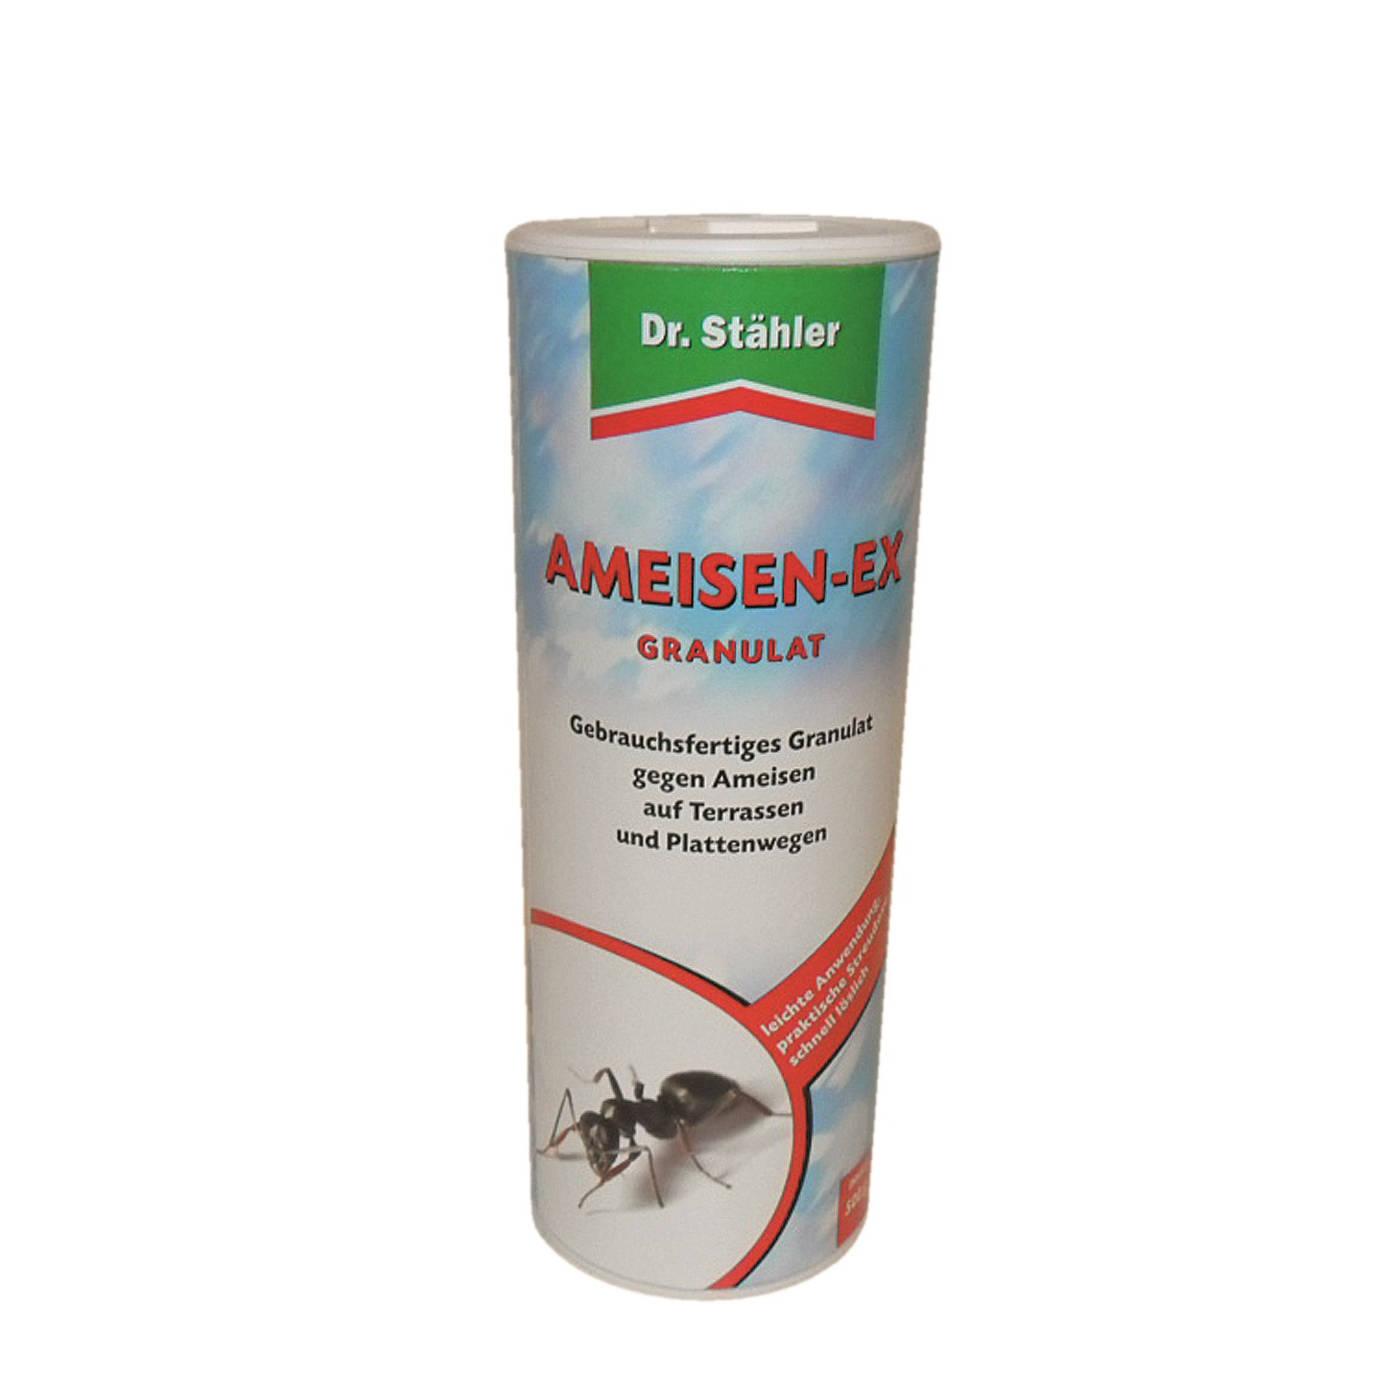 Dr. Stähler Ameisen-Ex Granulat 500 g